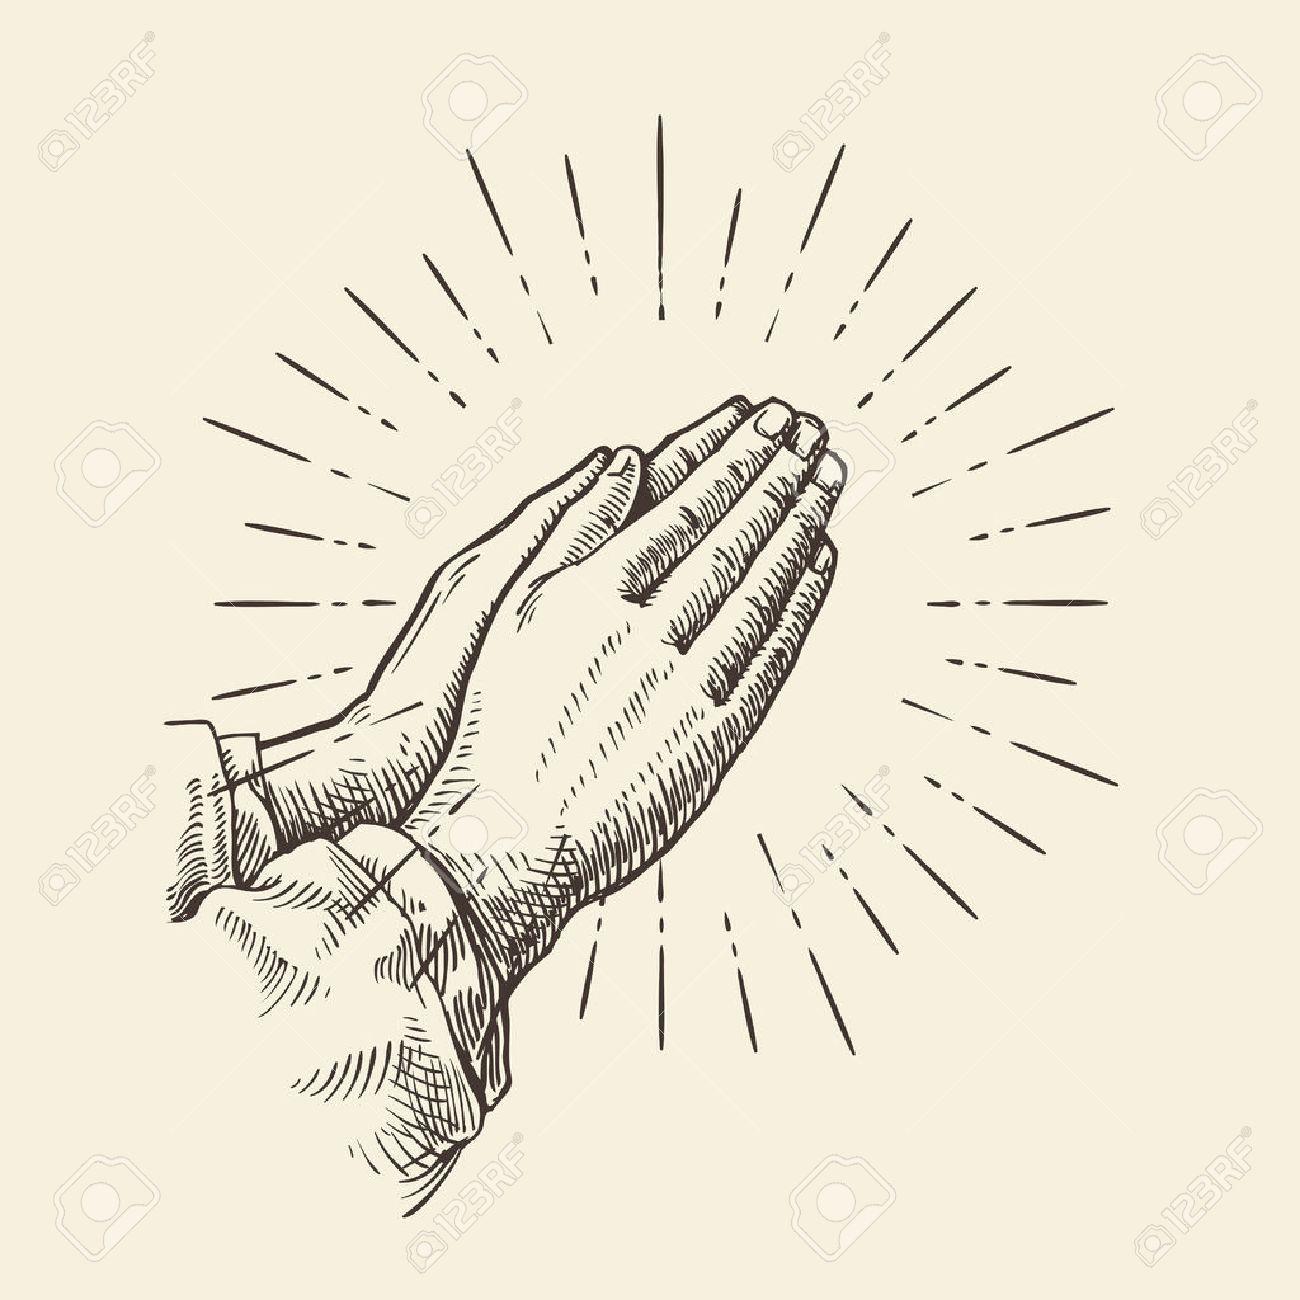 1300x1300 Praying Hands. Hand Drawn Sketch Vector Illustration Royalty Free